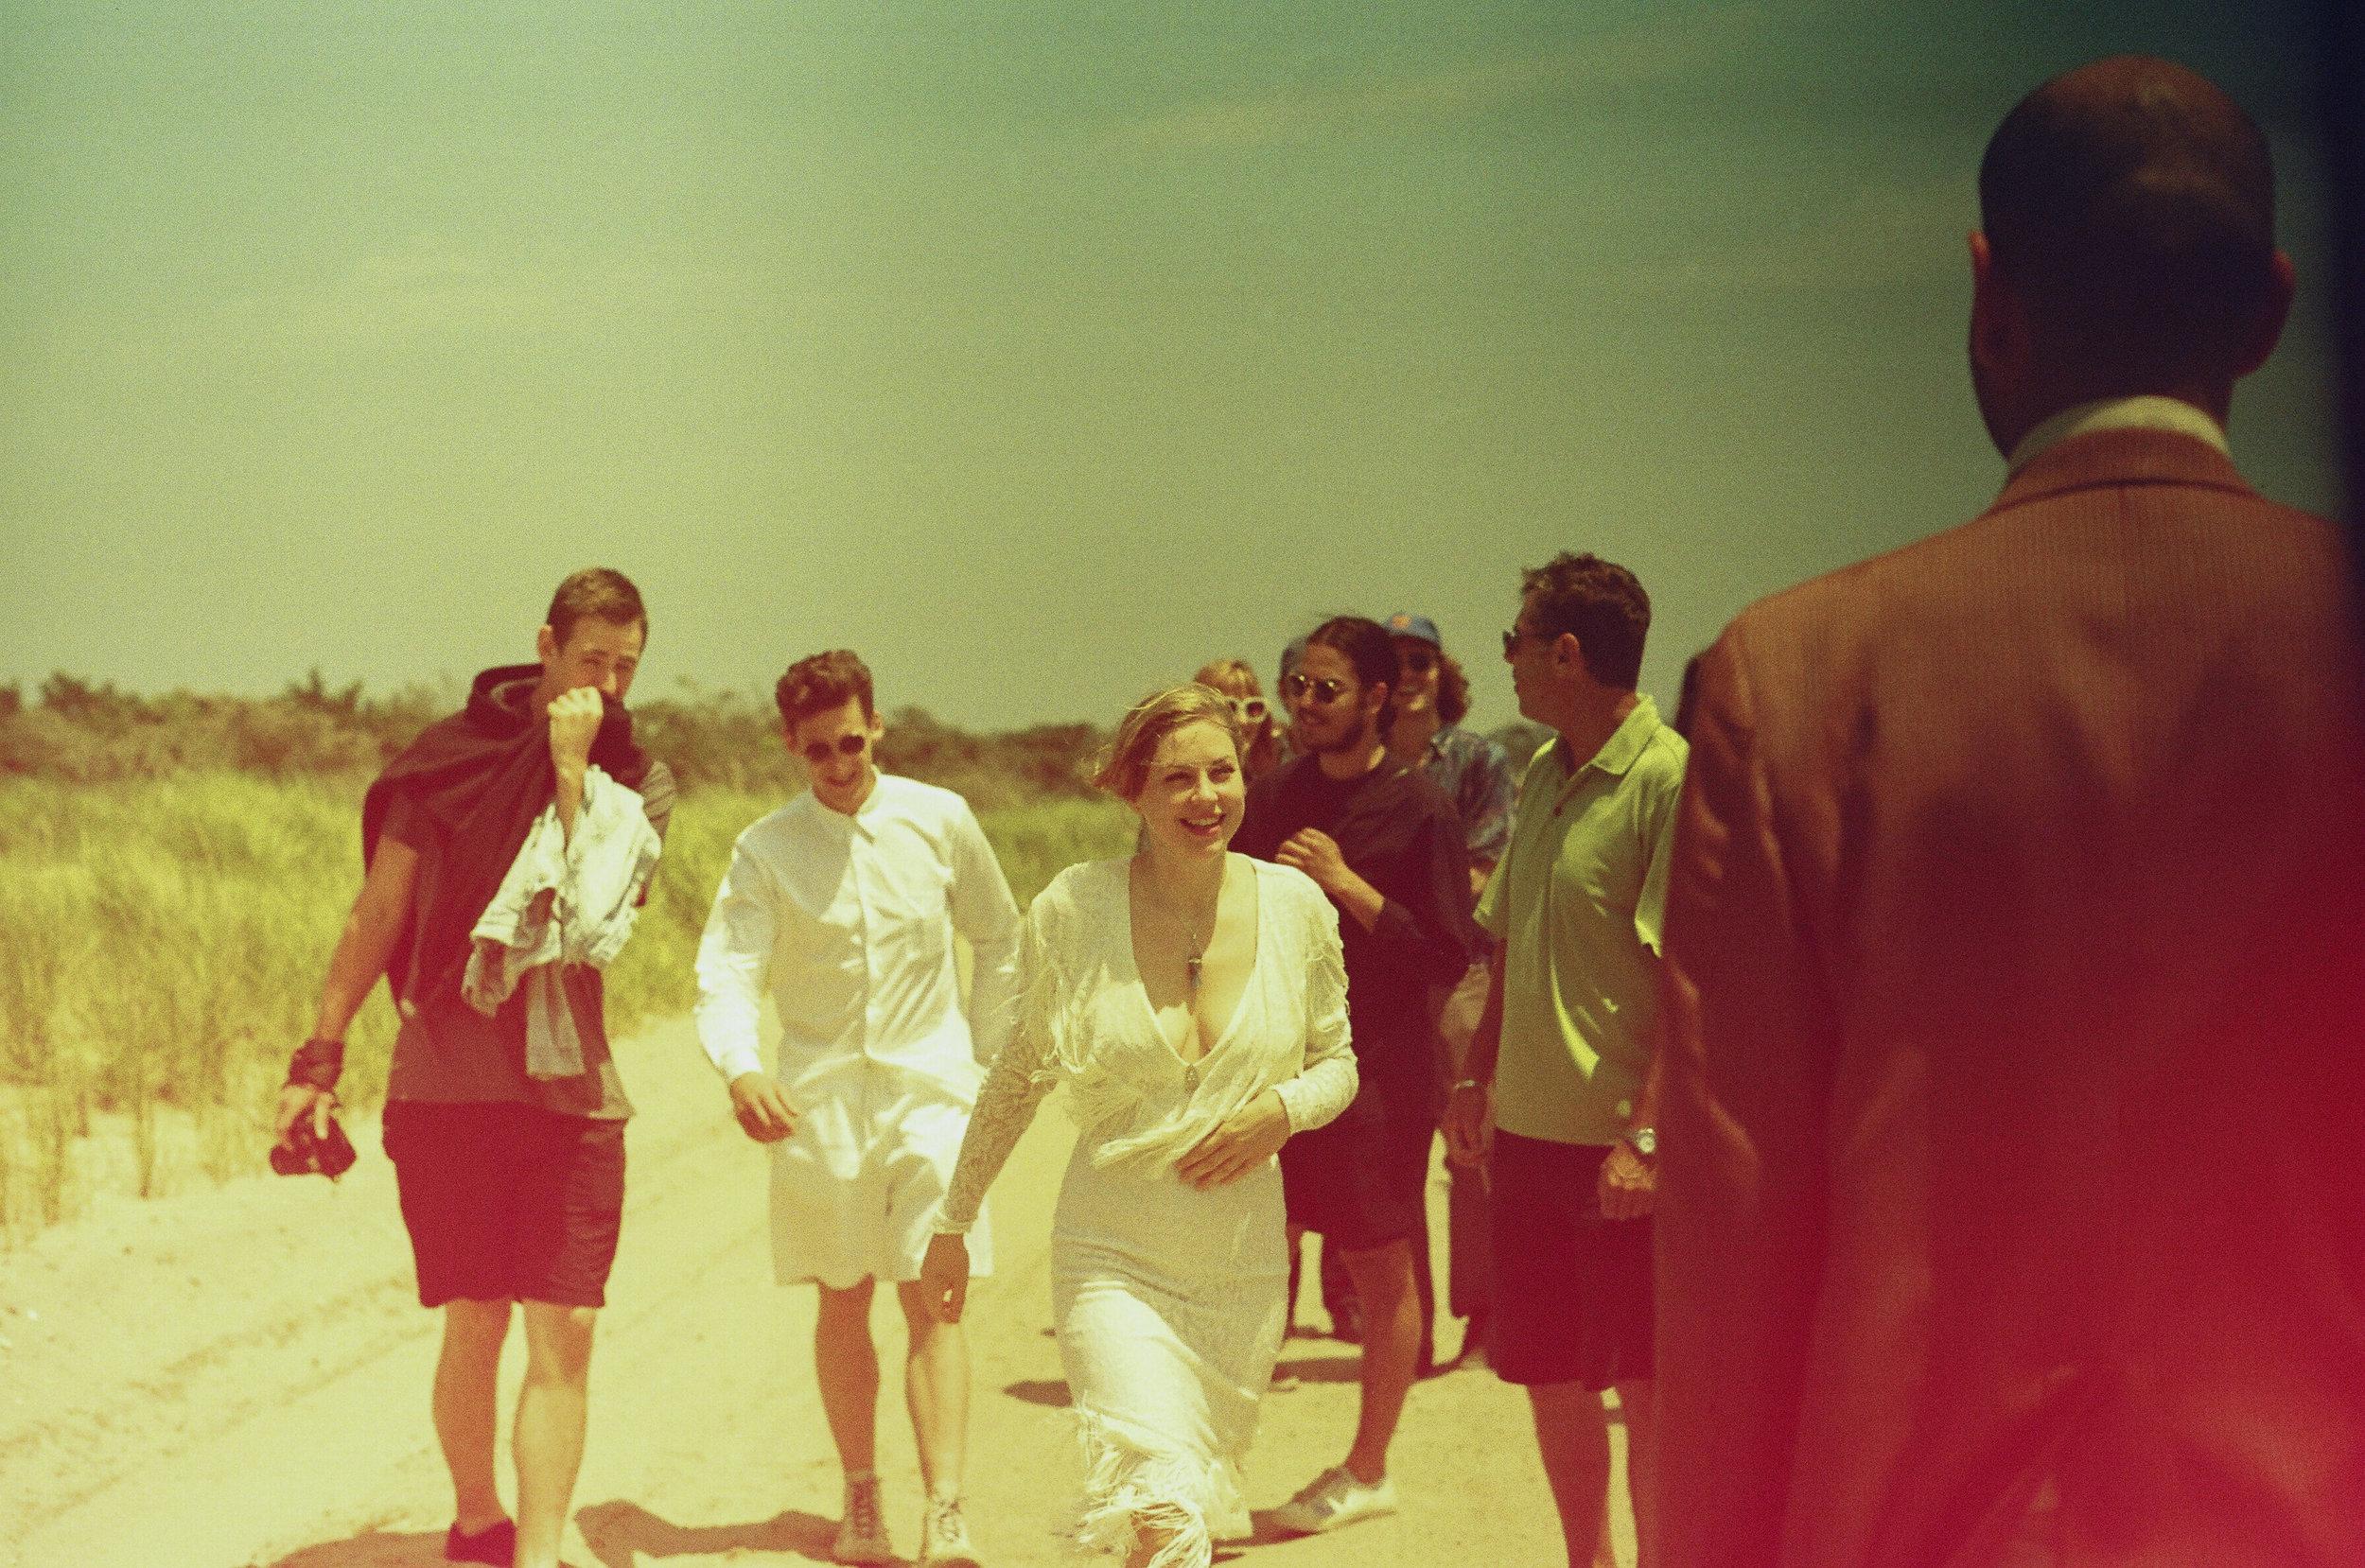 Fire_Island_Wedding_Bohemian_Photographer_ChelliseMichaelPhotography-1400.jpg